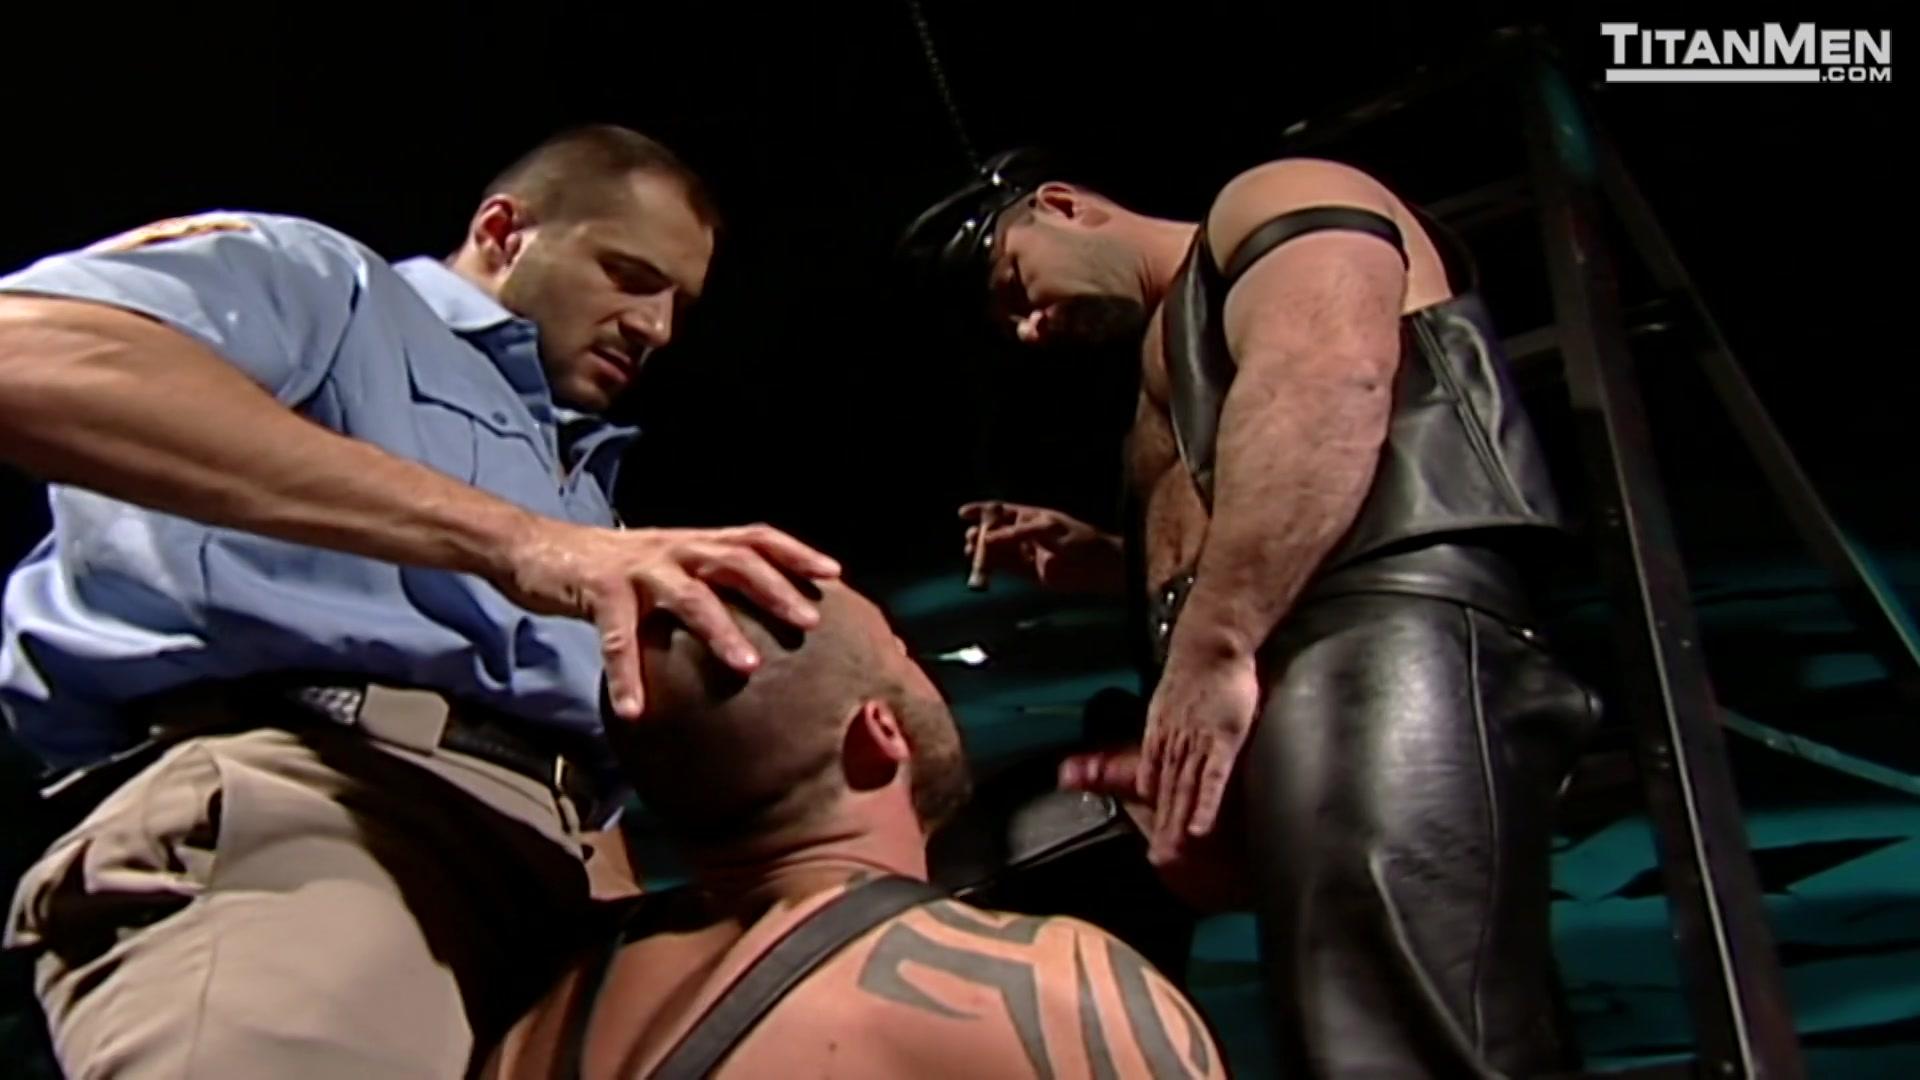 Folsom Leather Directors Cut  Titanmen Gay Porn Movies -8805